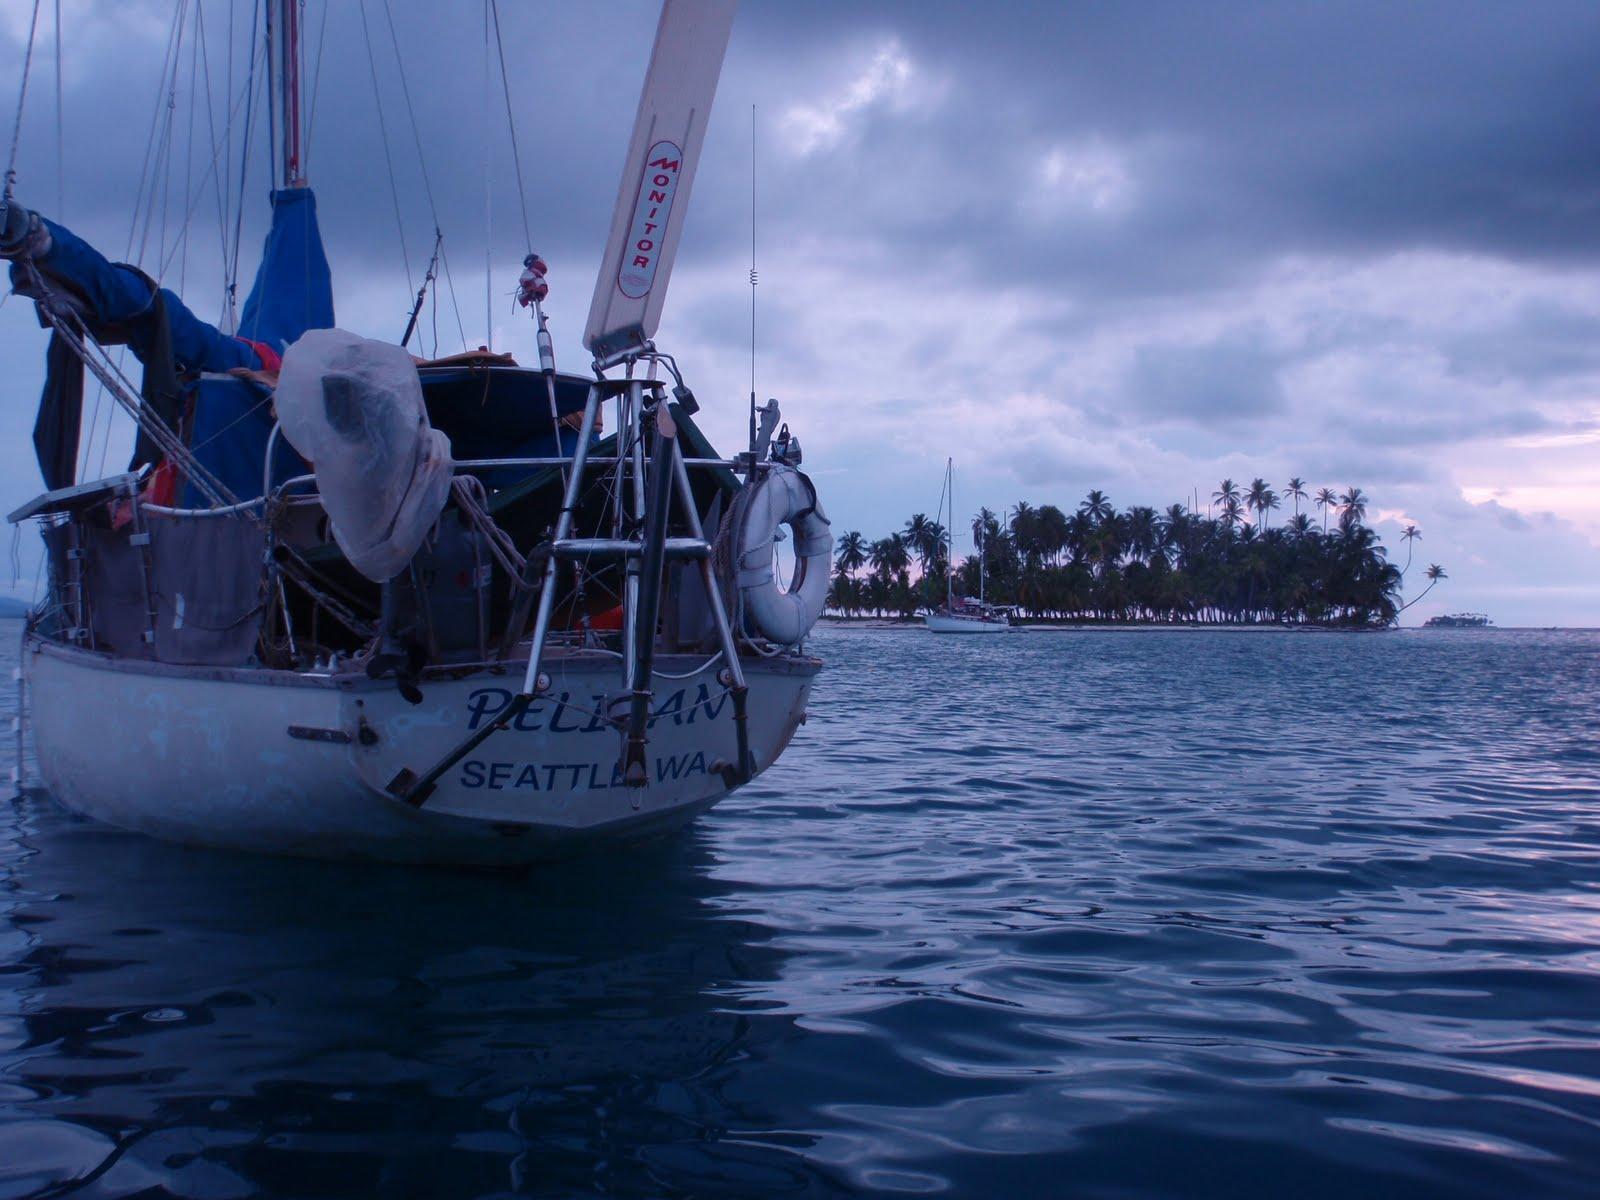 Sailing a Pearson Alberg 35: July 2010